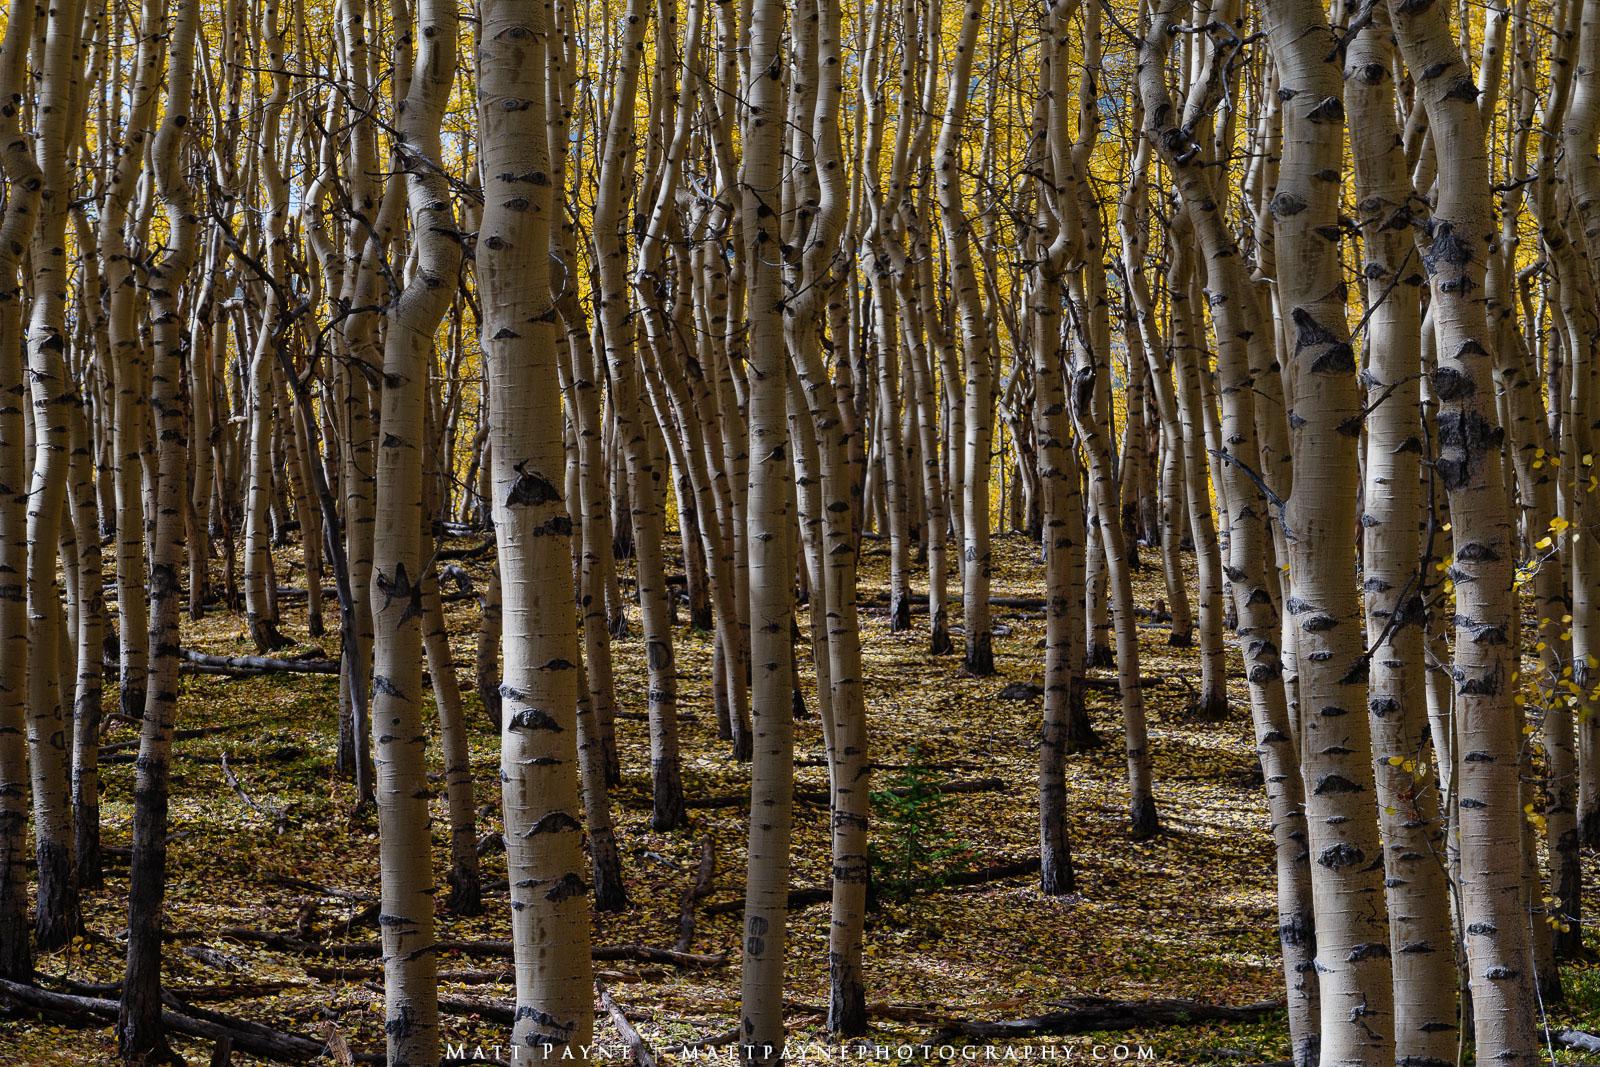 Aspen Trees, Autumn, Colorado, Eyes, Fall, Fall Colors, Landscape, aspen leaves, Landscape Photography, photo